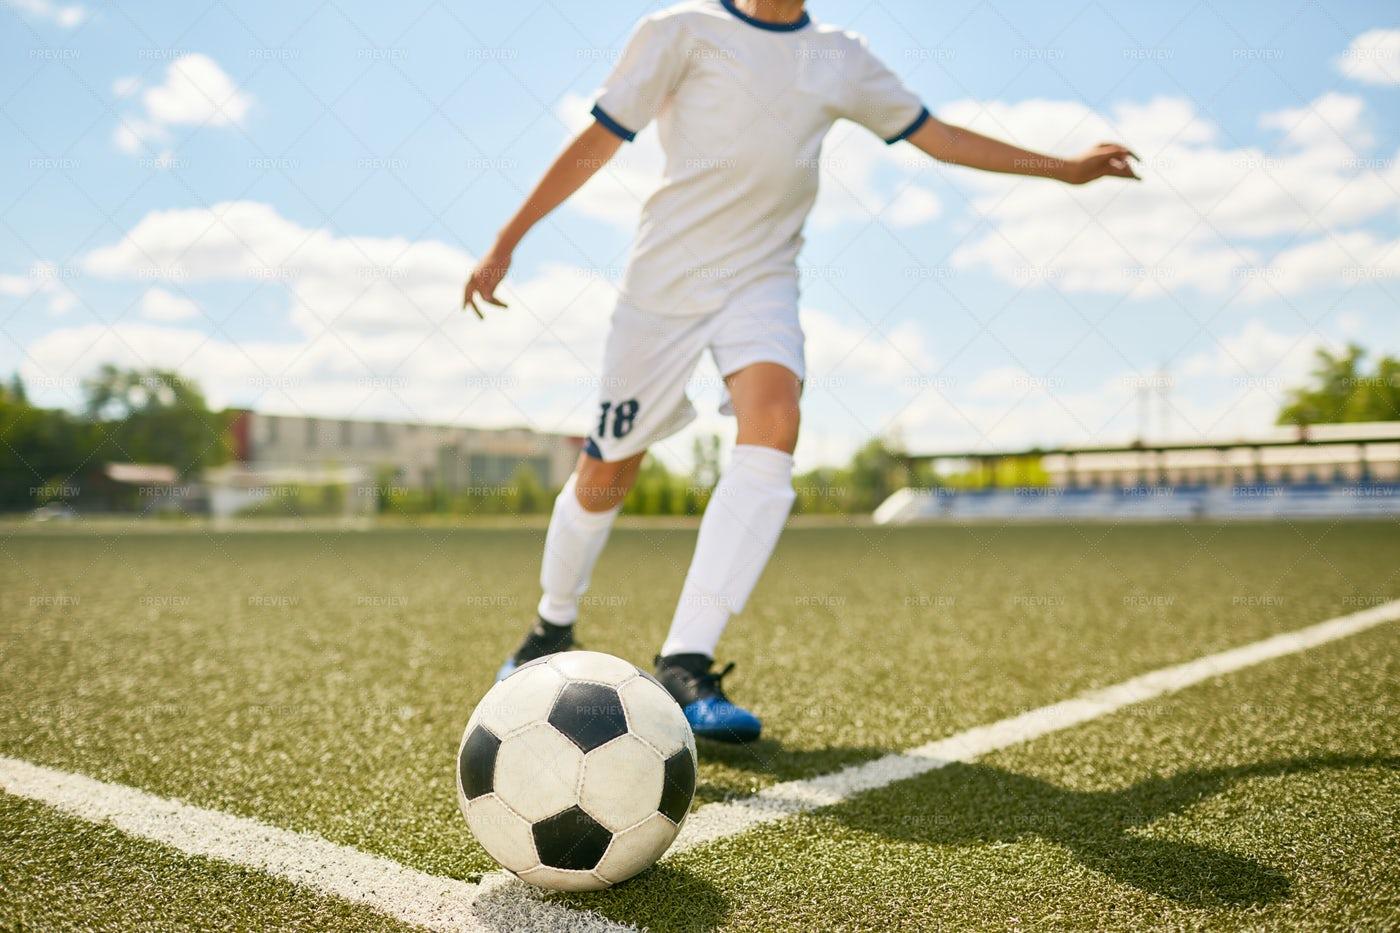 Boy In Uniform Kicking Ball On...: Stock Photos